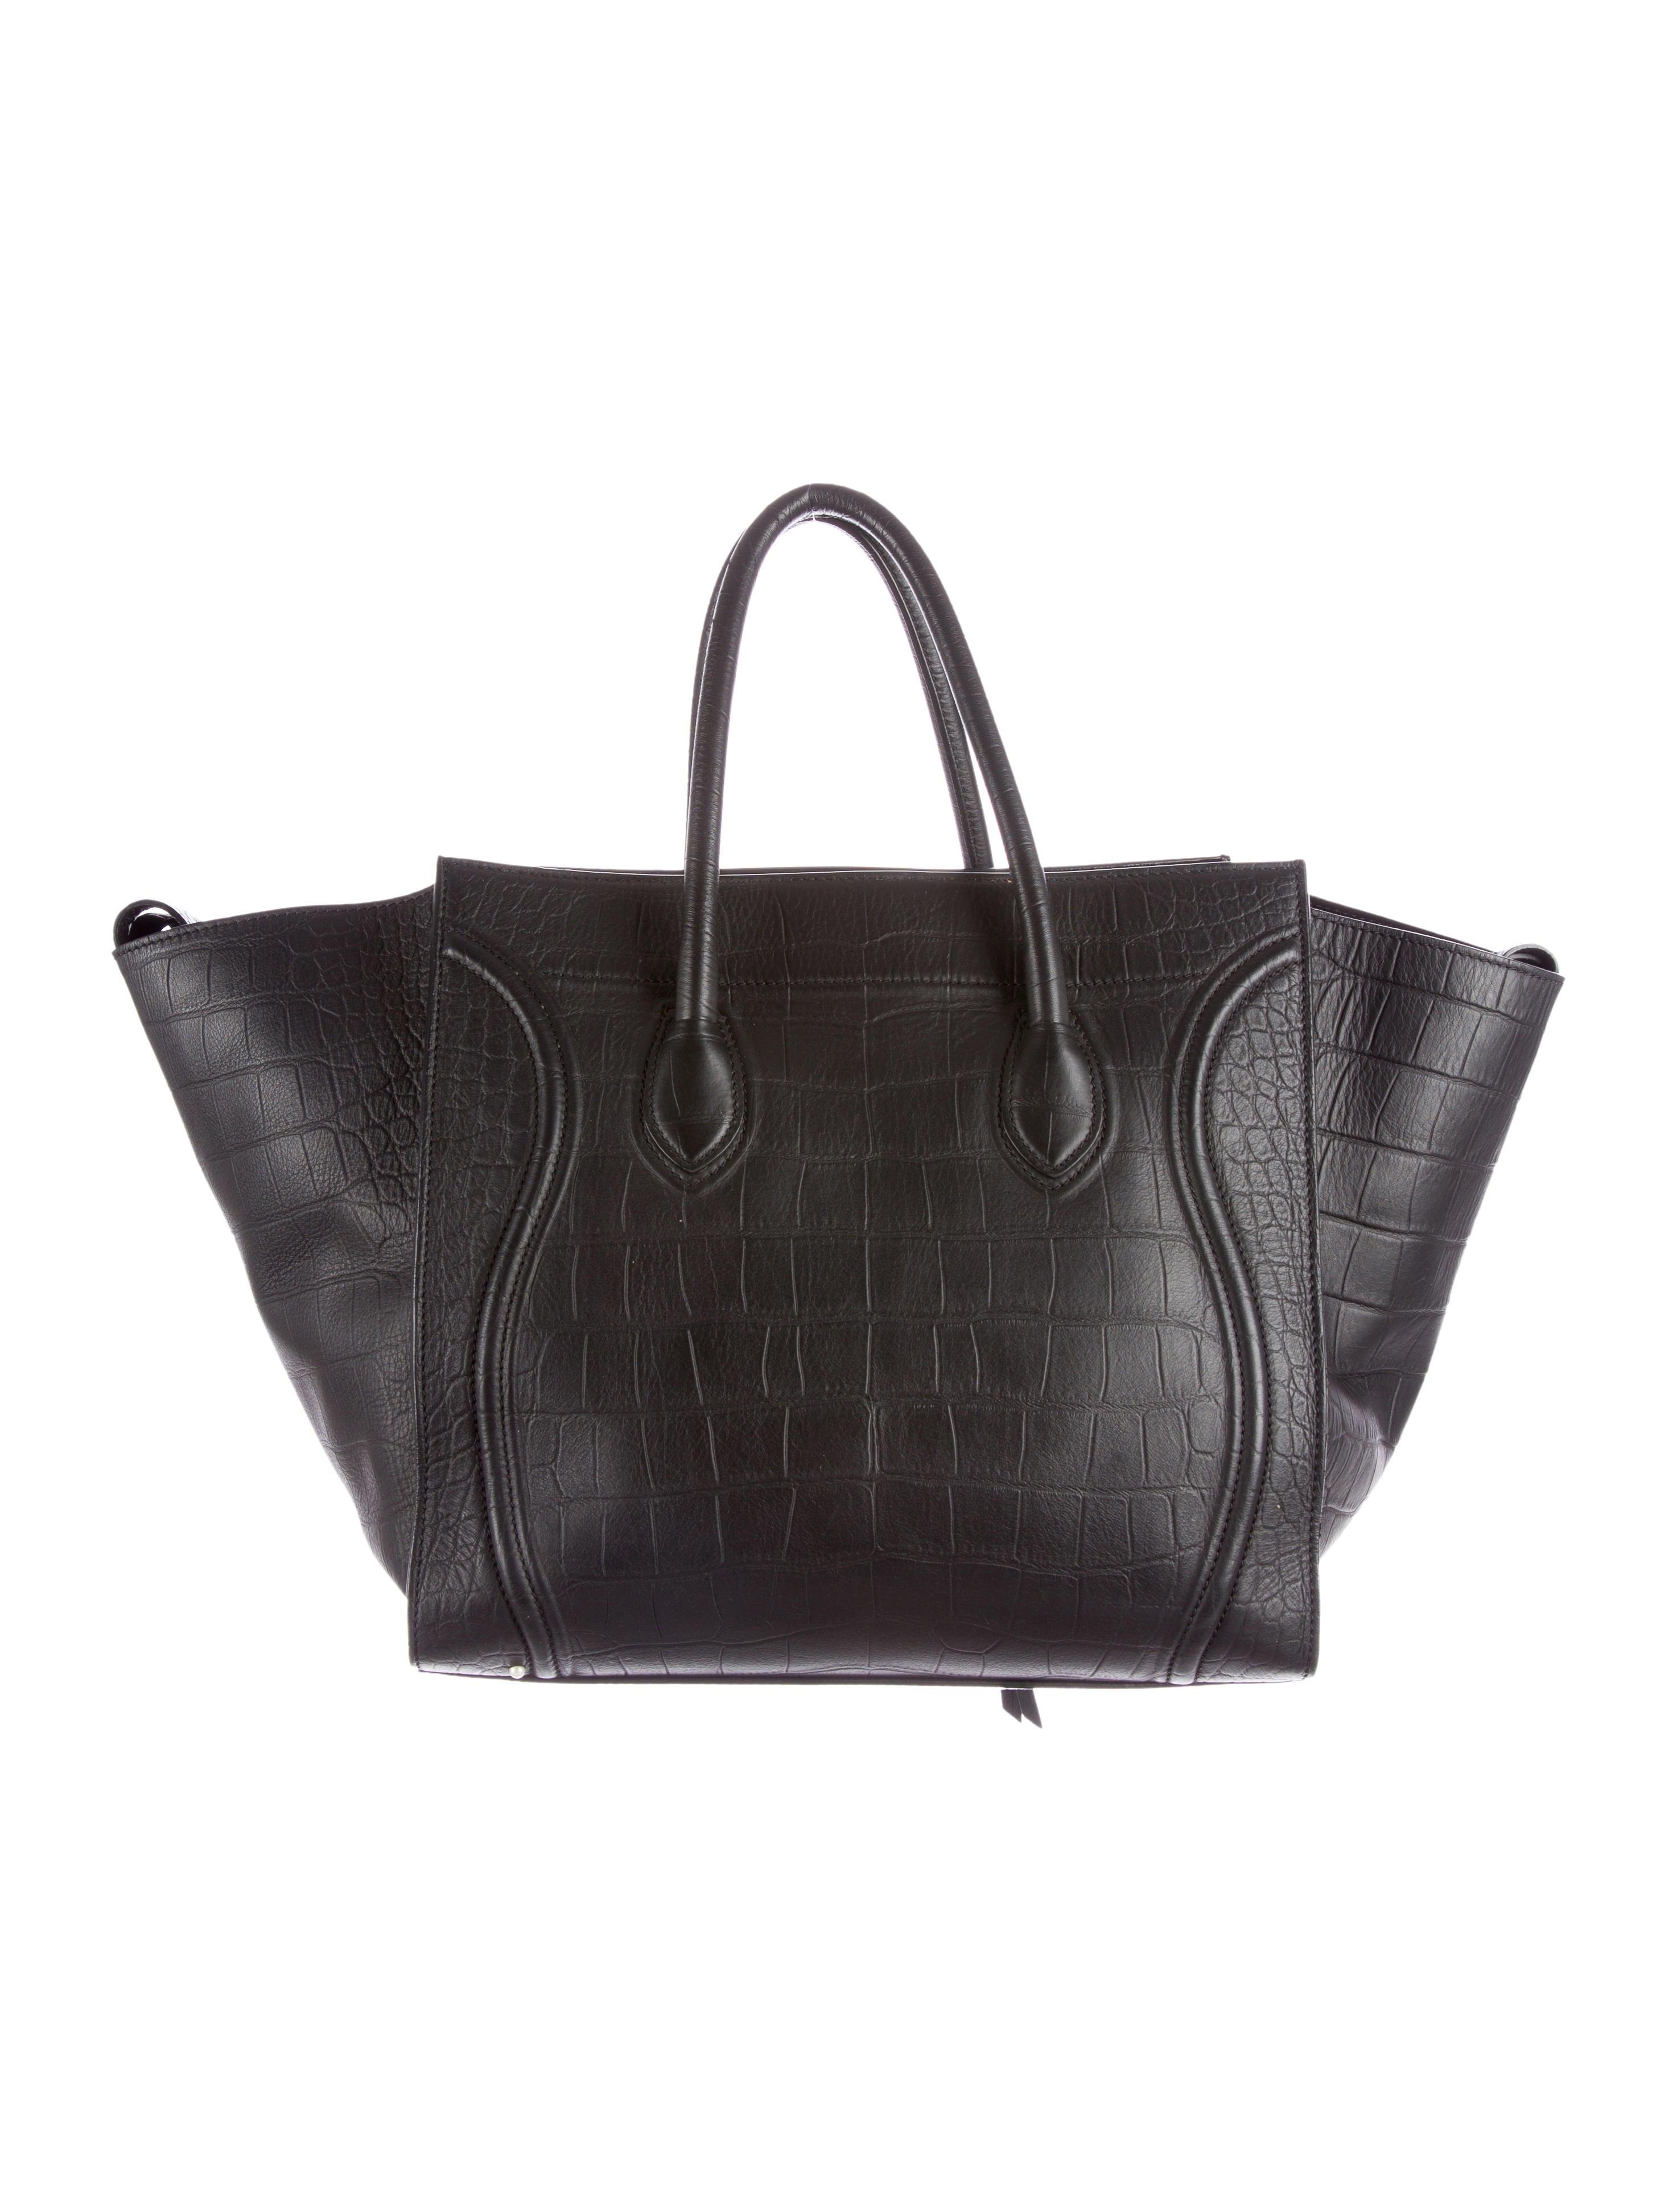 08ae806df2 Céline Large Phantom Bag - Handbags - CEL26637